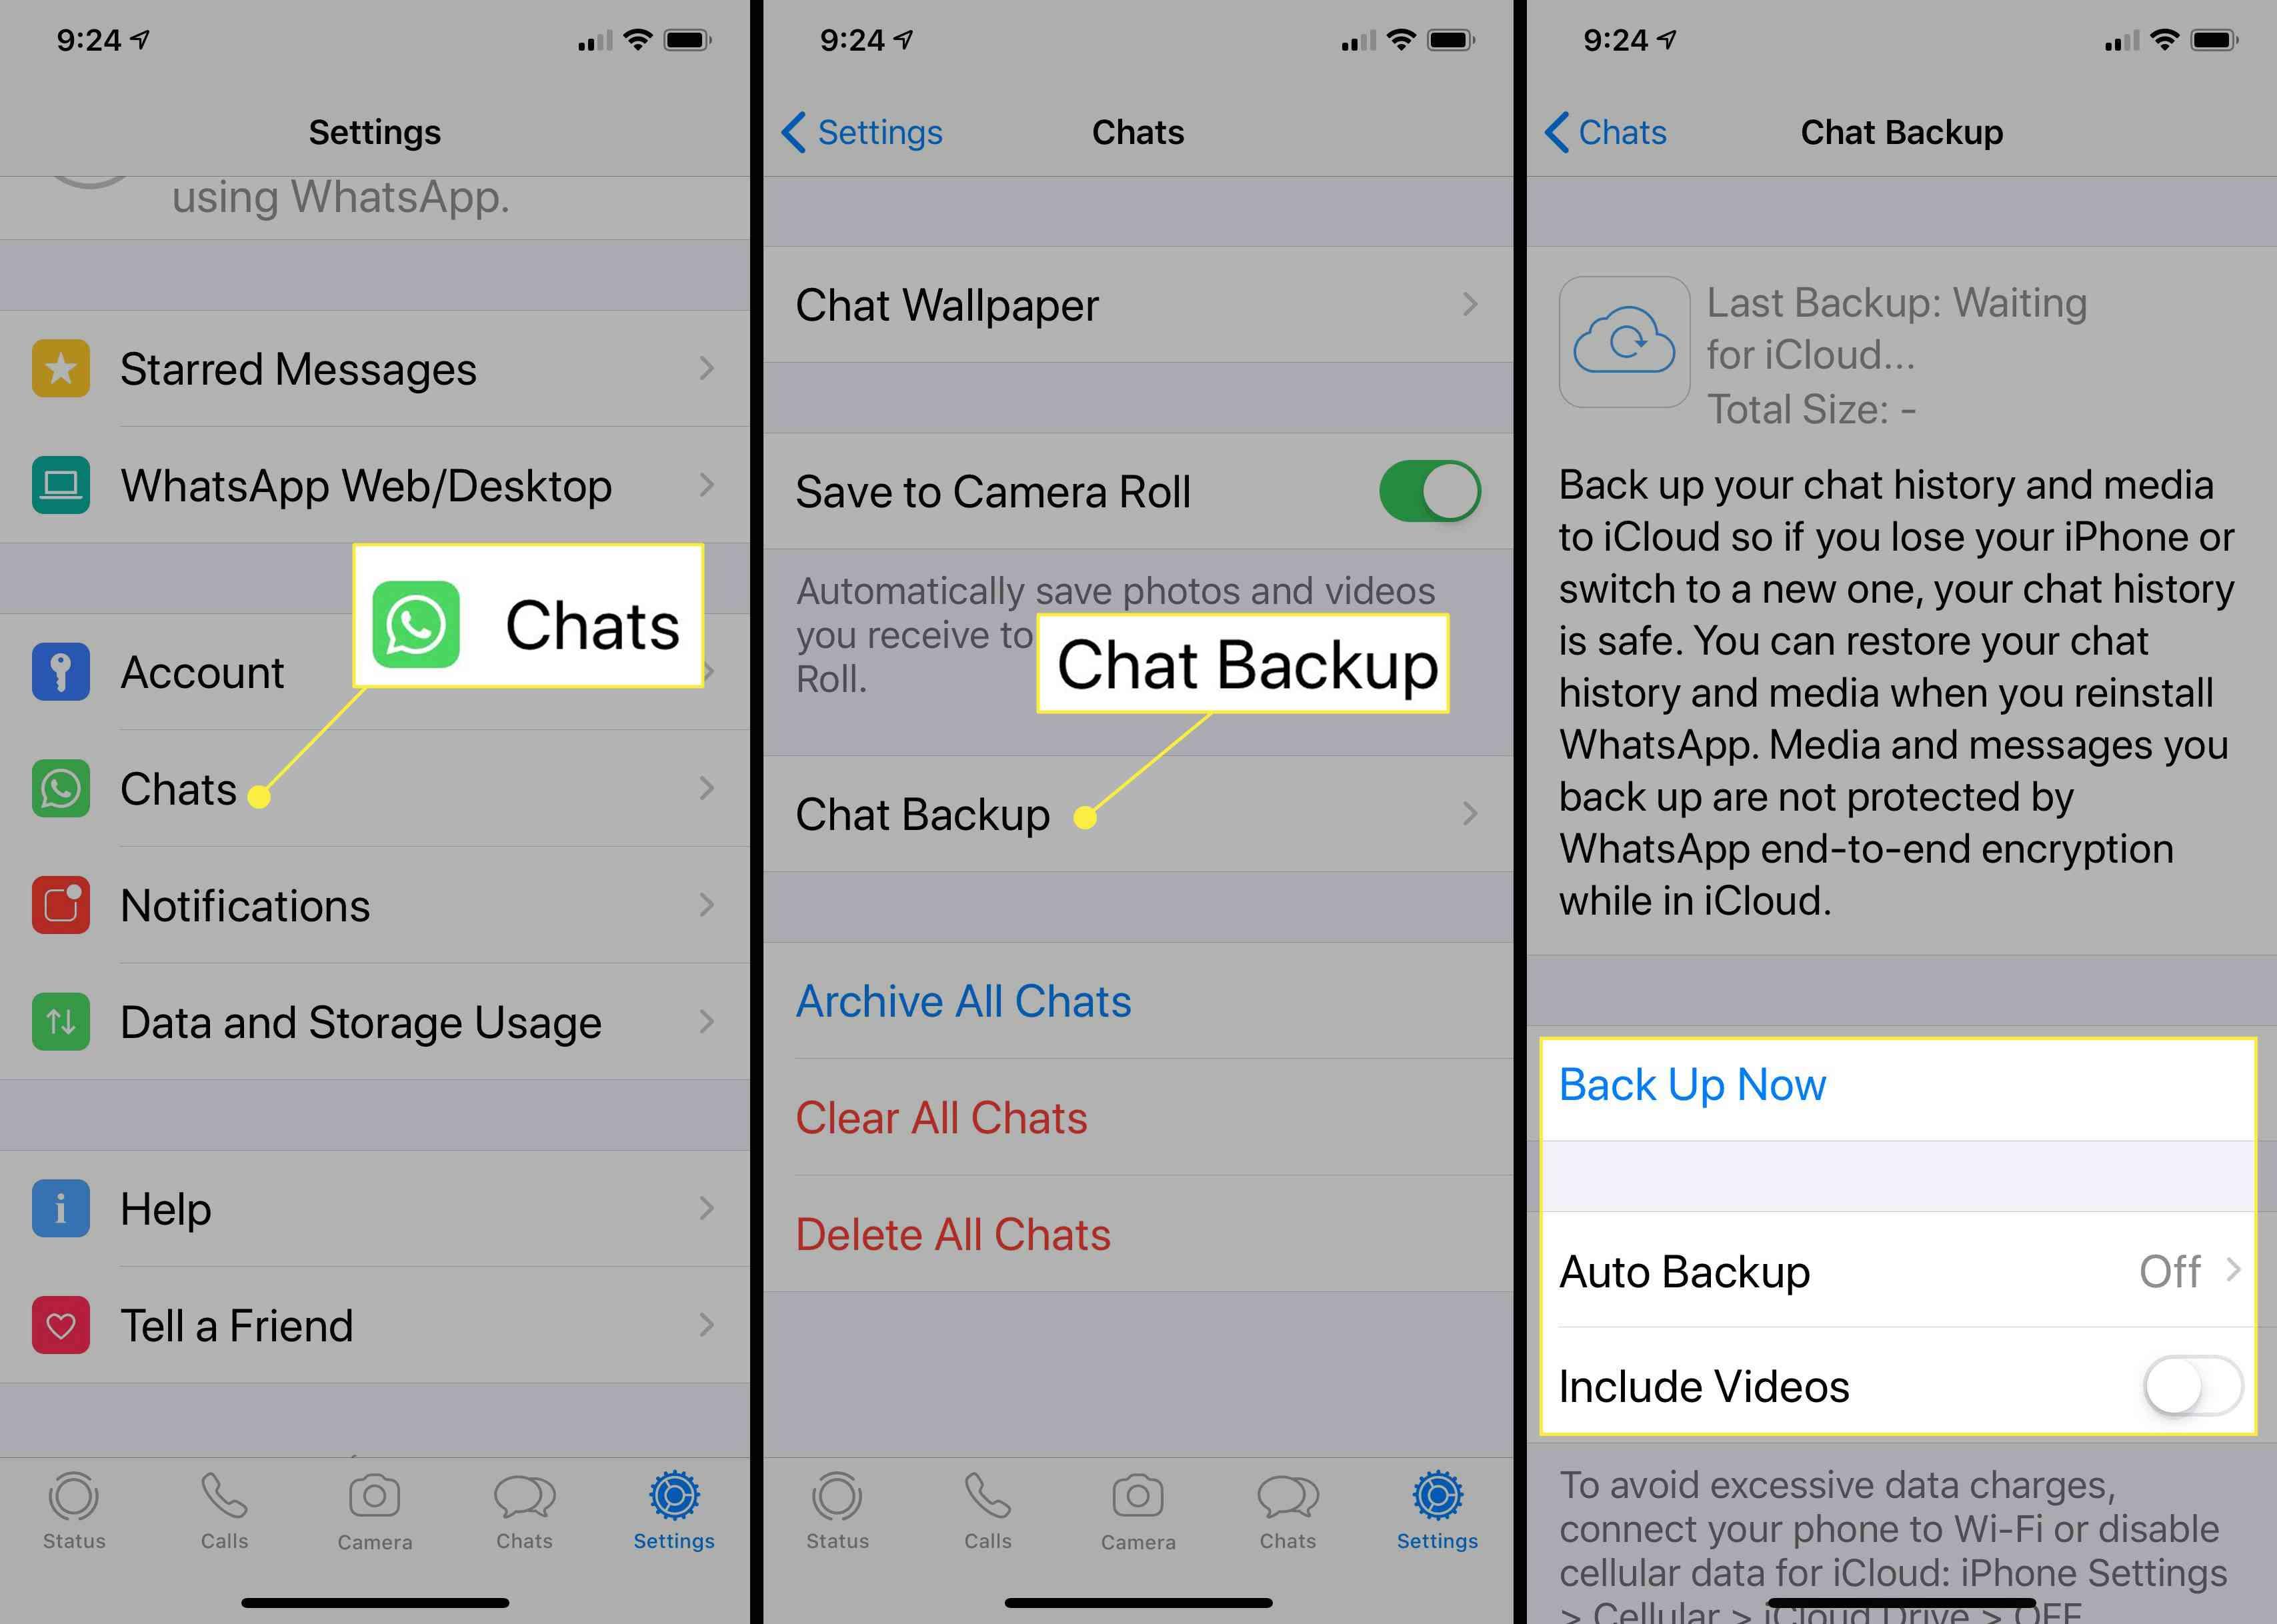 Chat backup options